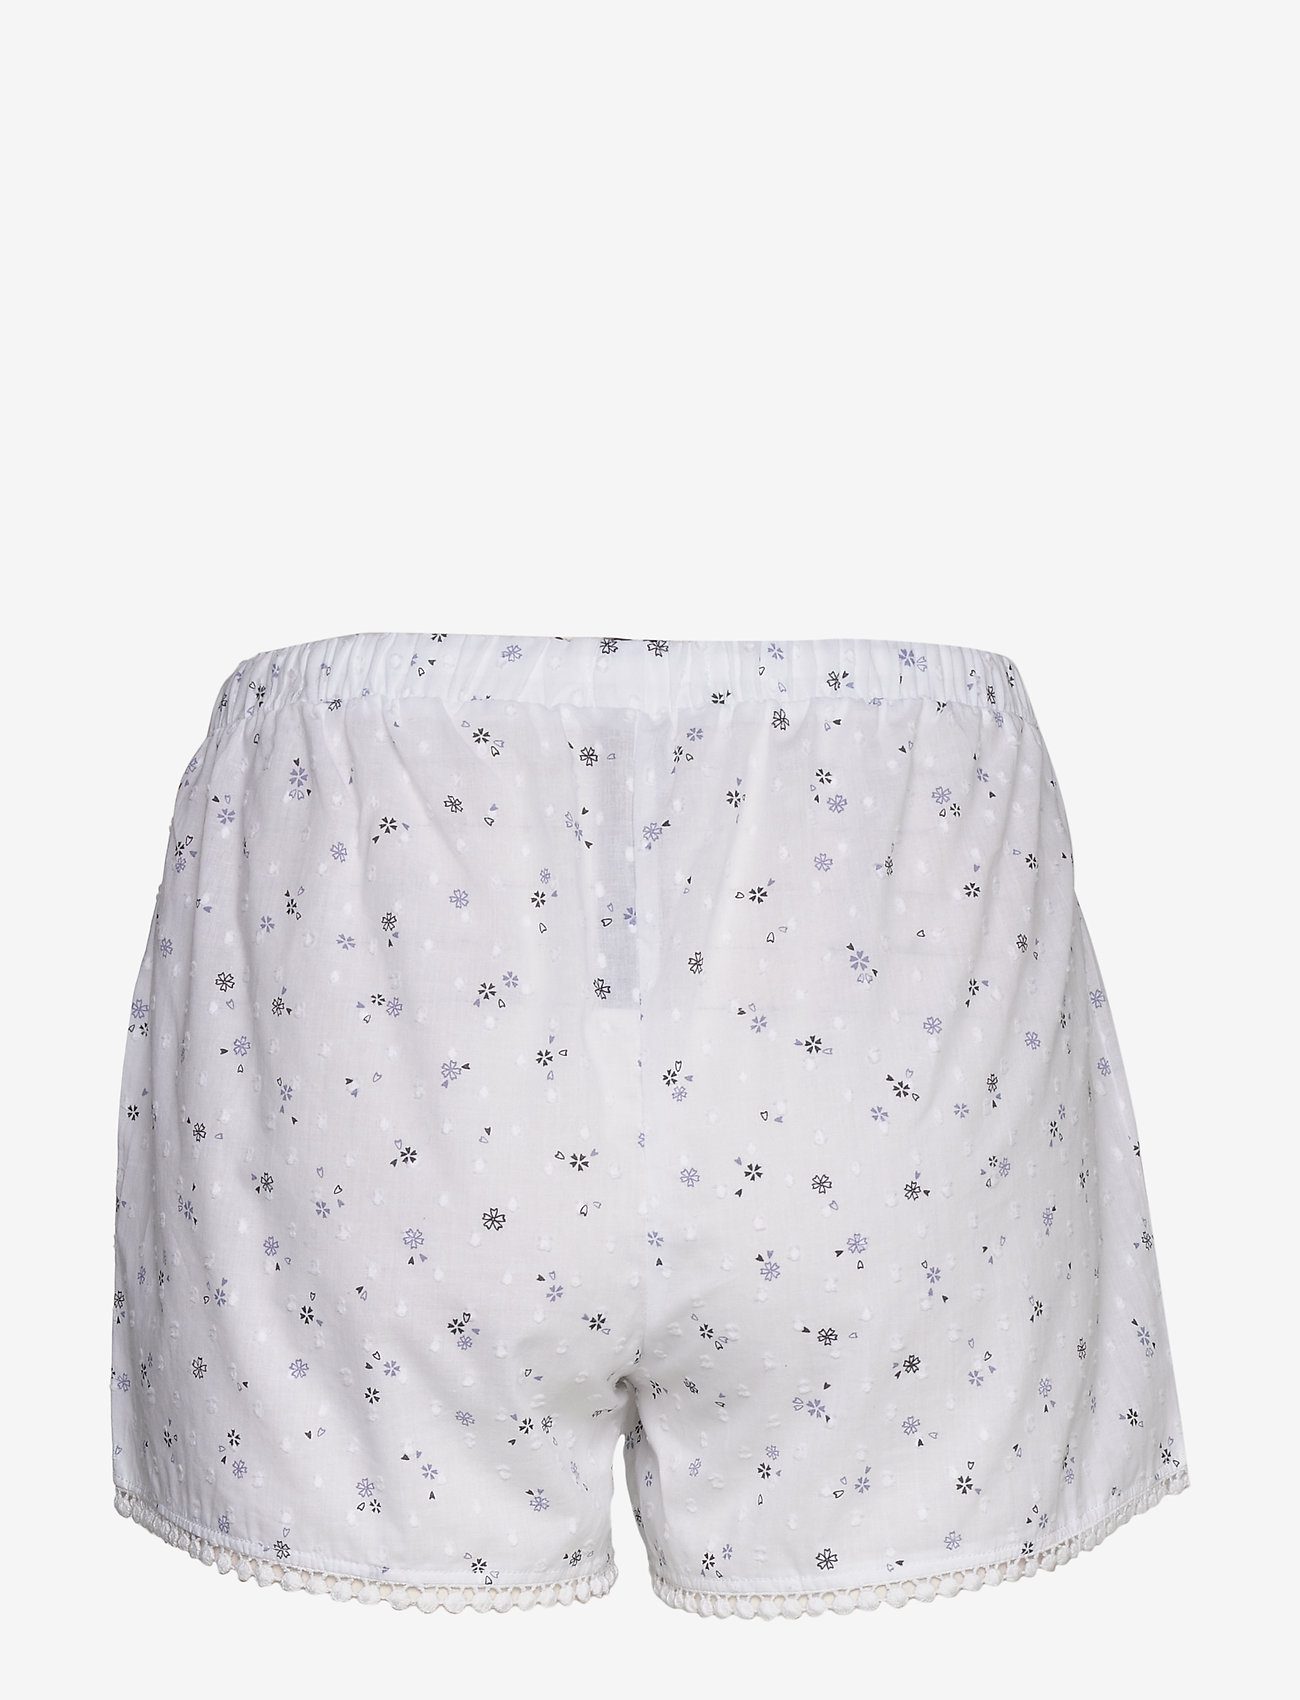 Esprit Bodywear Women - Nightpants - shorts - white - 1